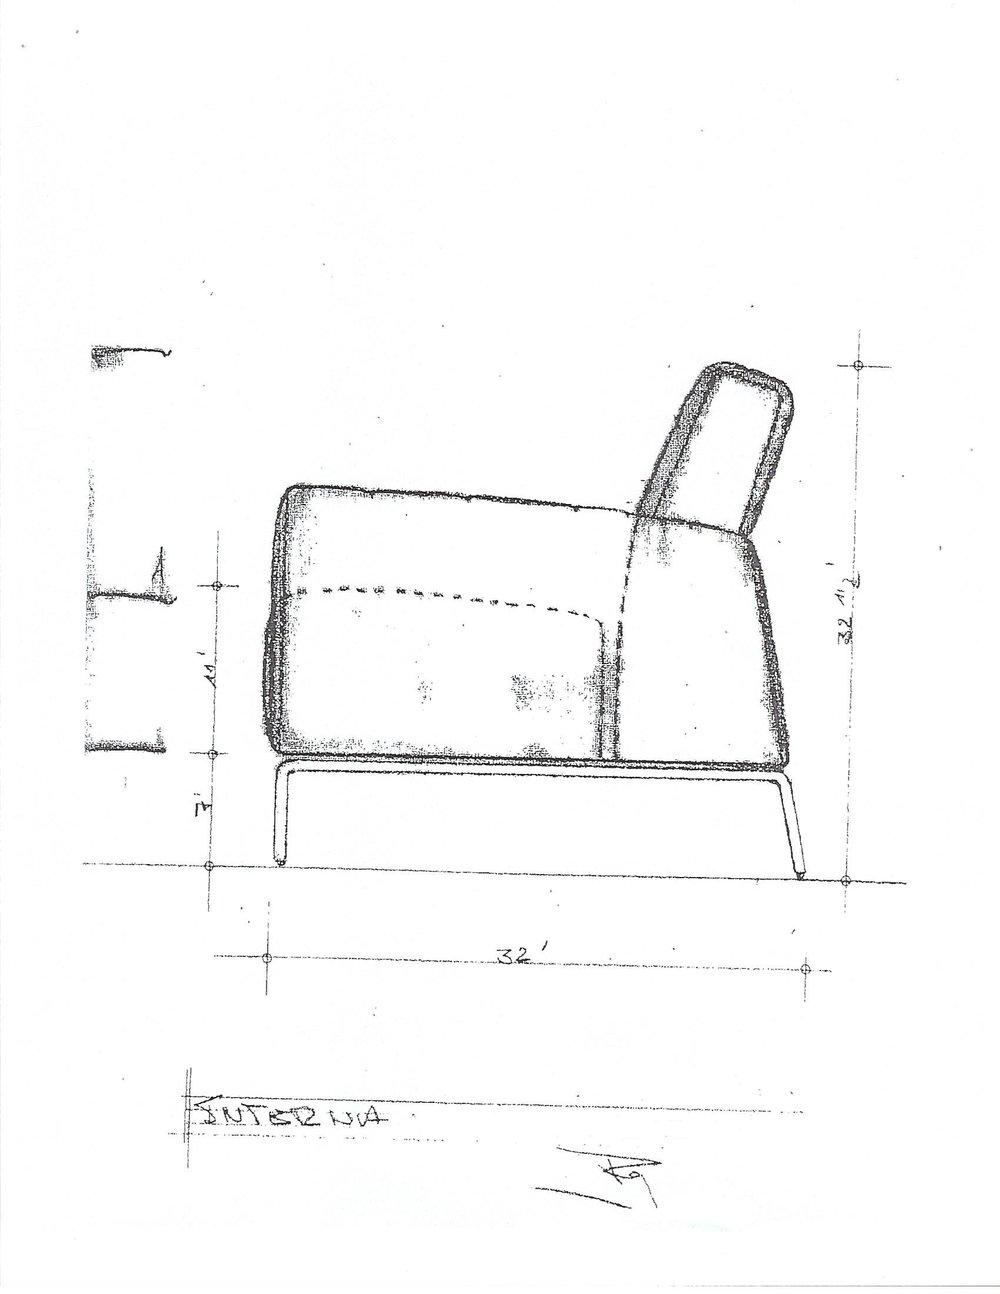 history-Model 495 draw.jpg